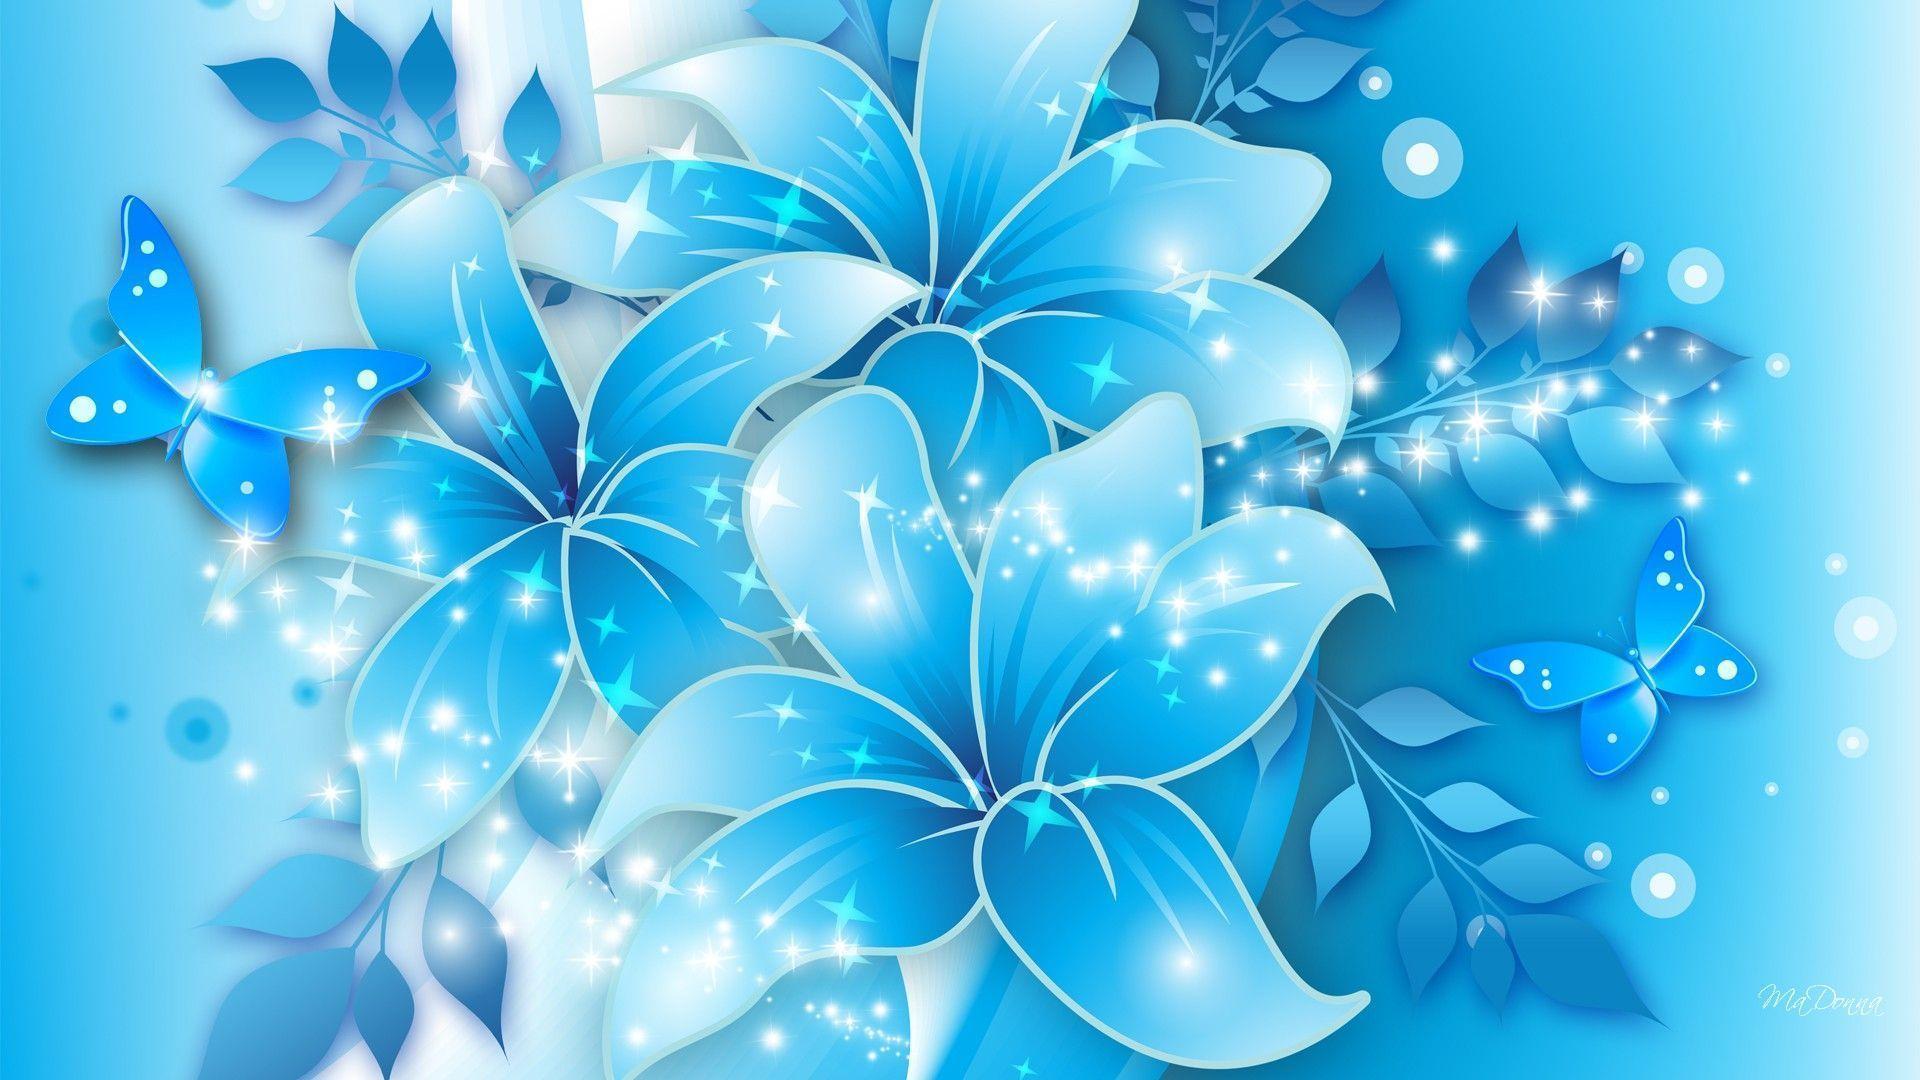 Blue Flowers Tumblr Background